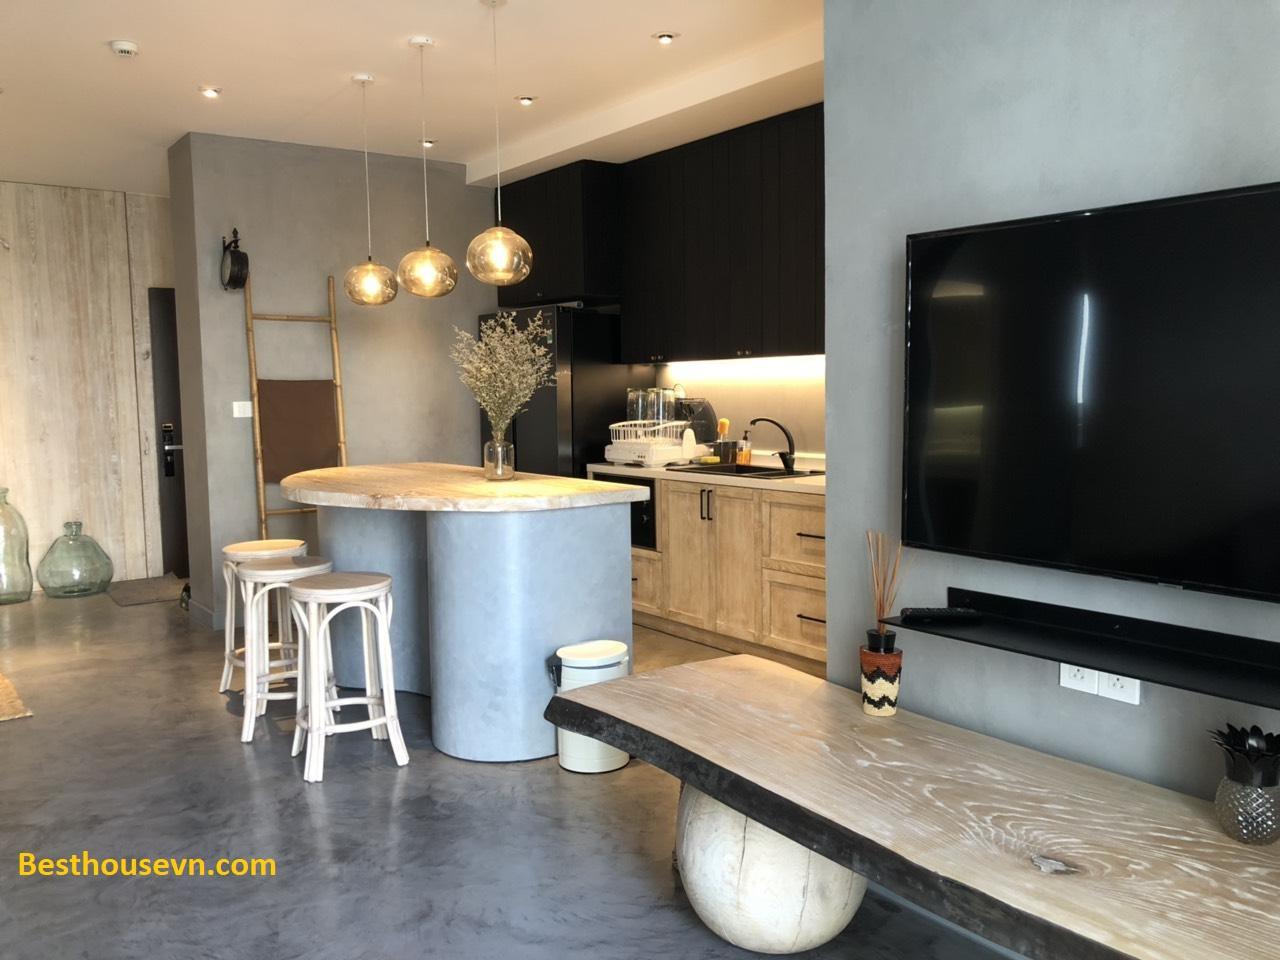 Apartment-for-rent-in-river-park-premier-district -7-2